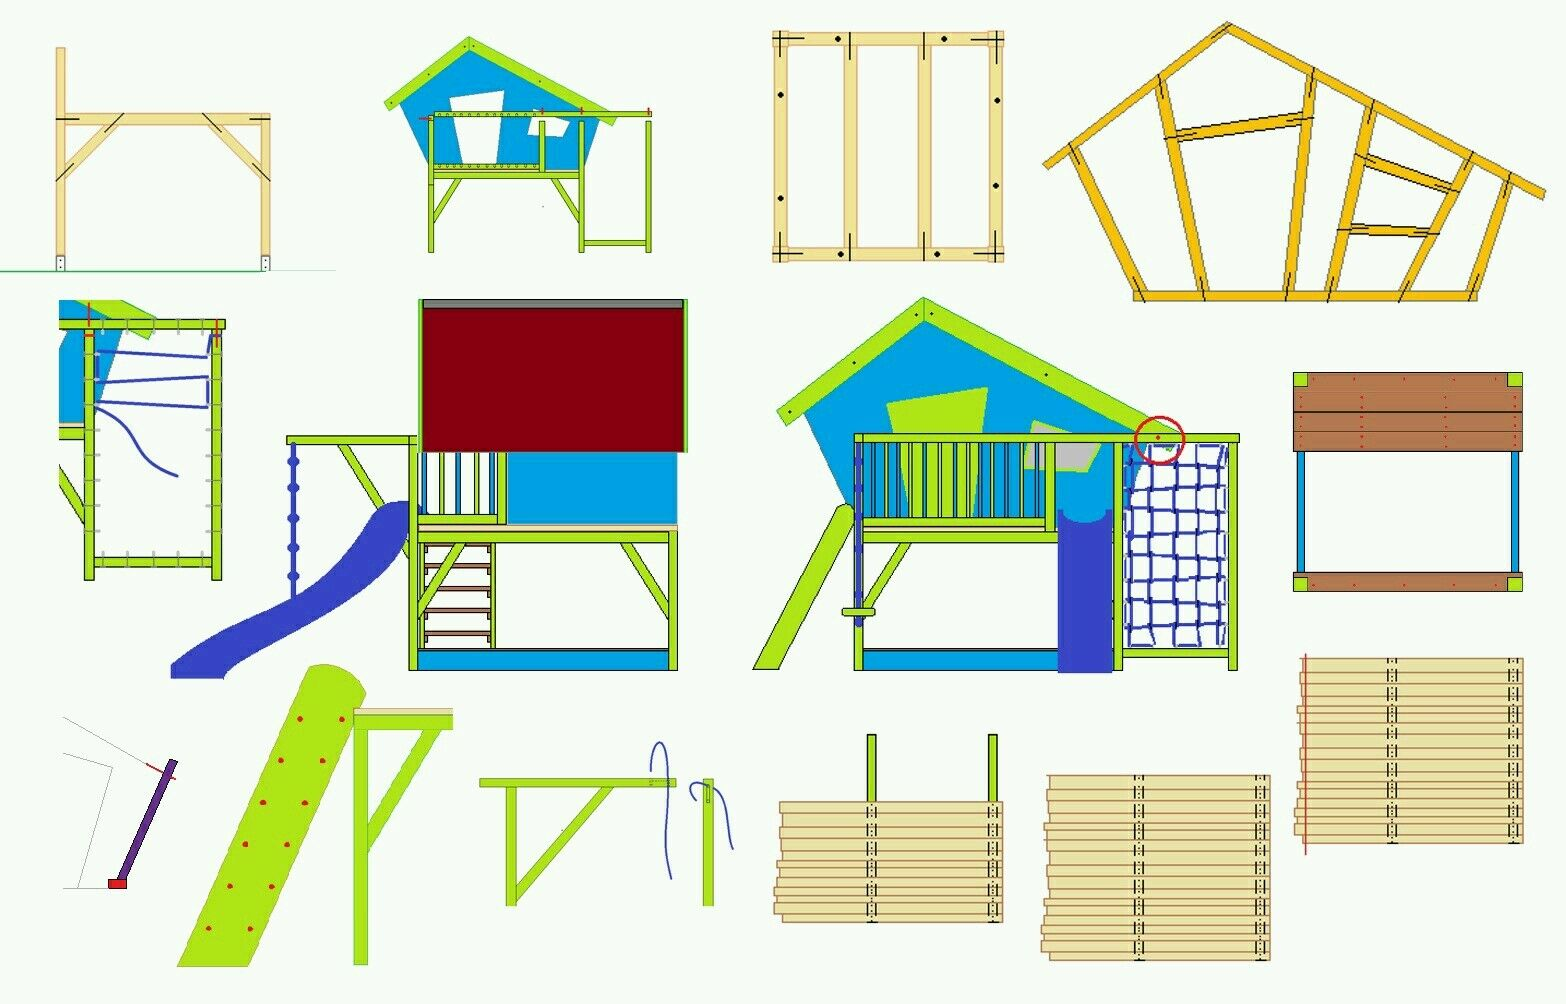 bauanleitung kinderspielhaus, bauplan | ebay